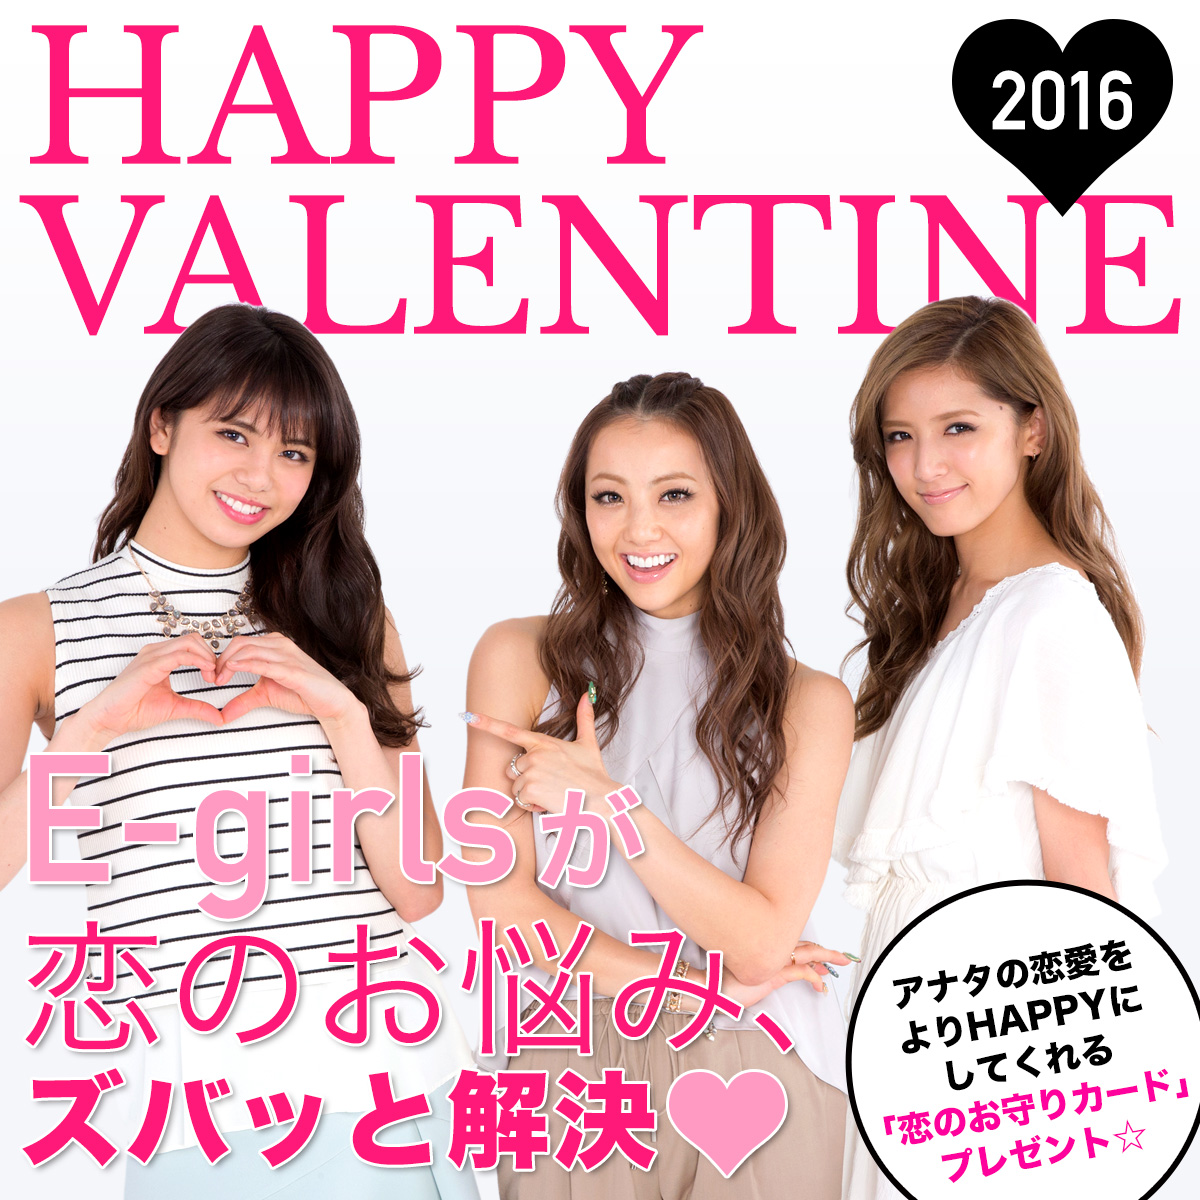 Happy Valentine 2016 初のベストをリリースするe Girlsが登場